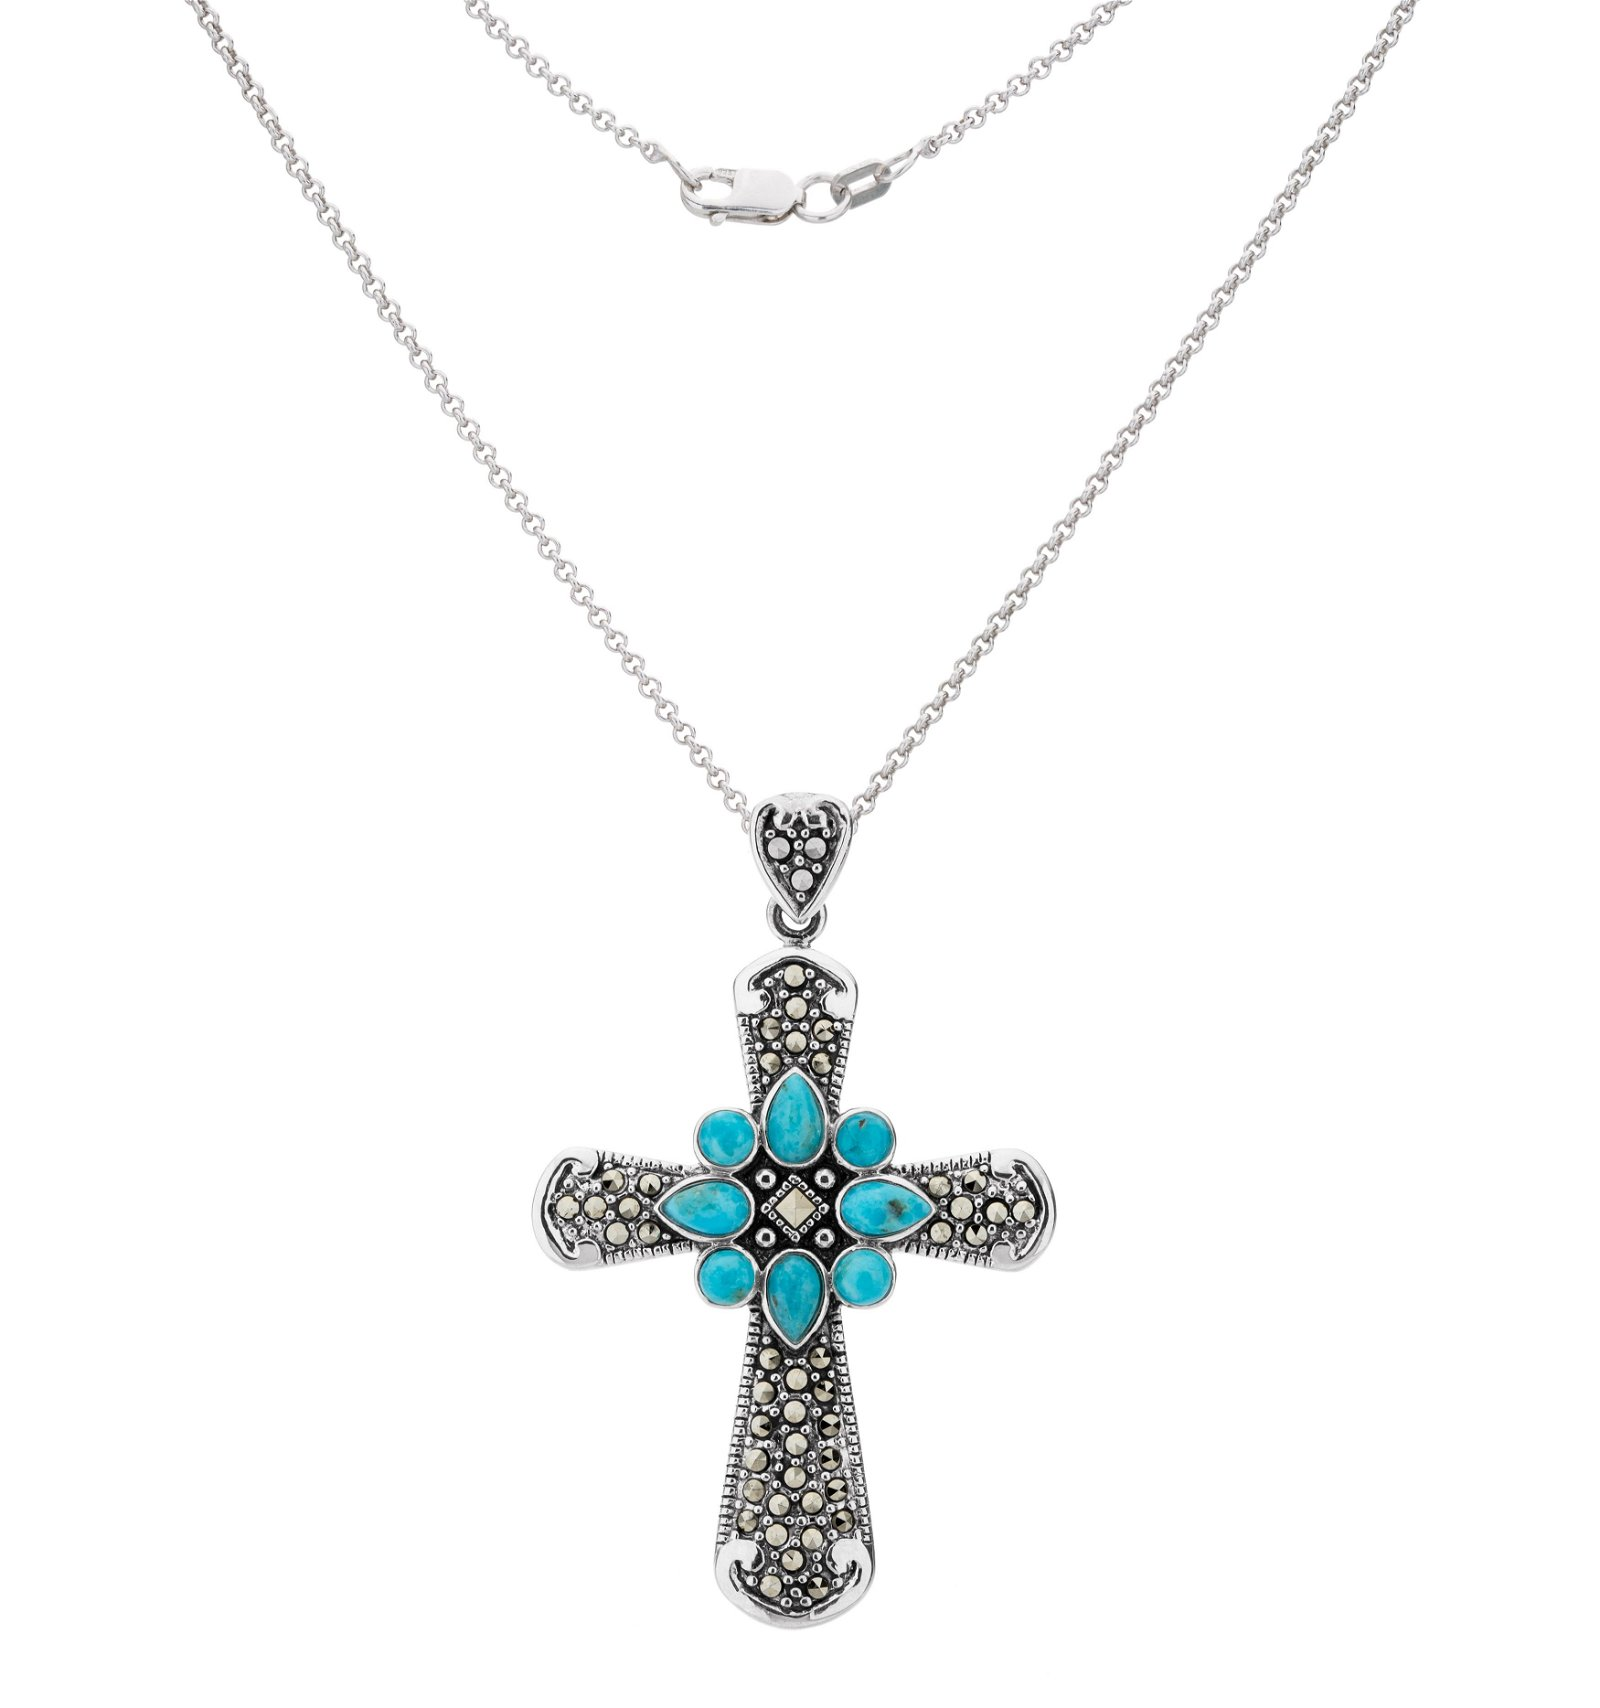 Silver Turquoise & Marcasite Cross Pendant